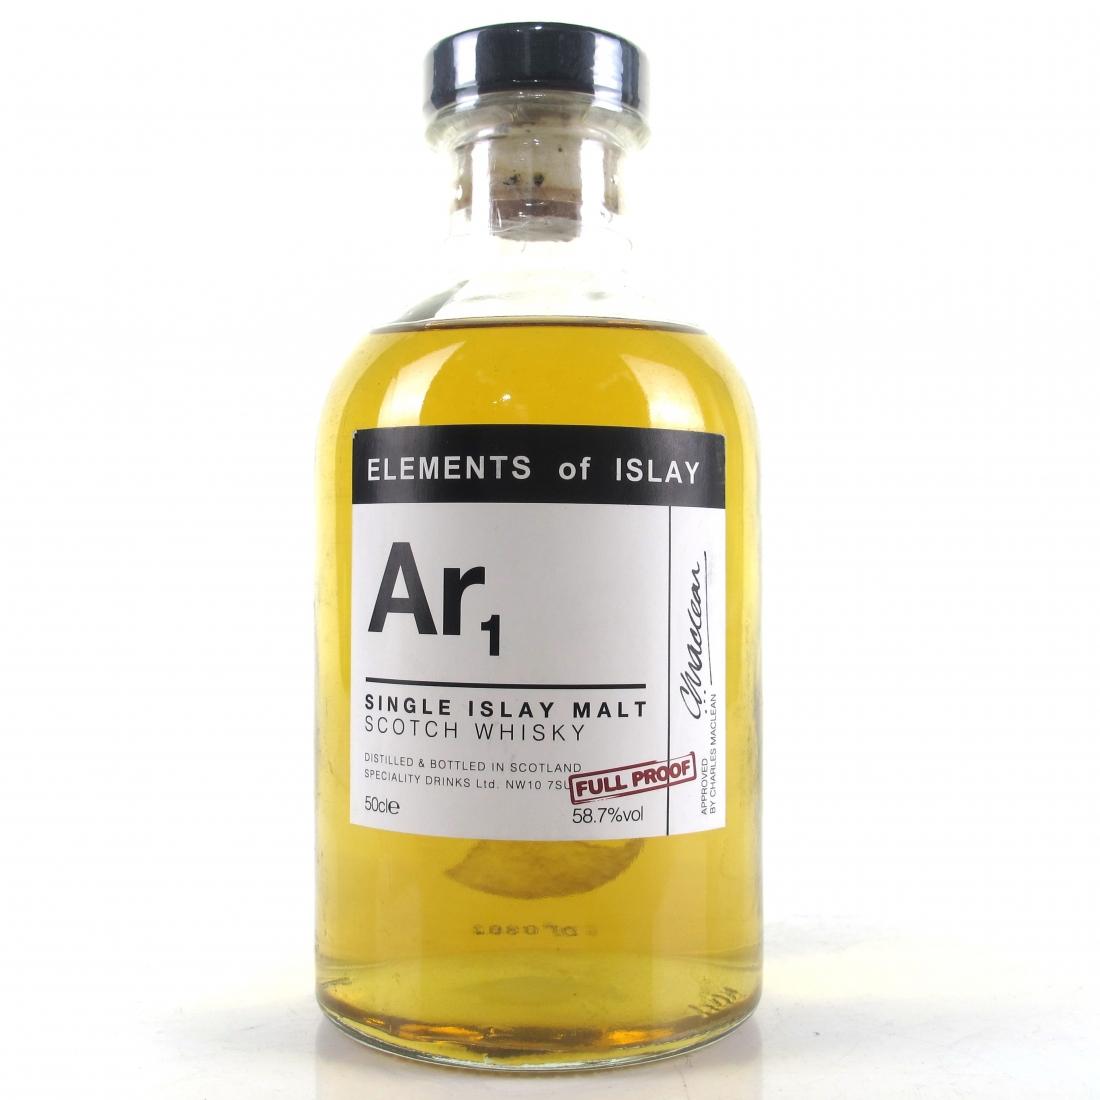 Ardbeg Ar1 Elements of Islay